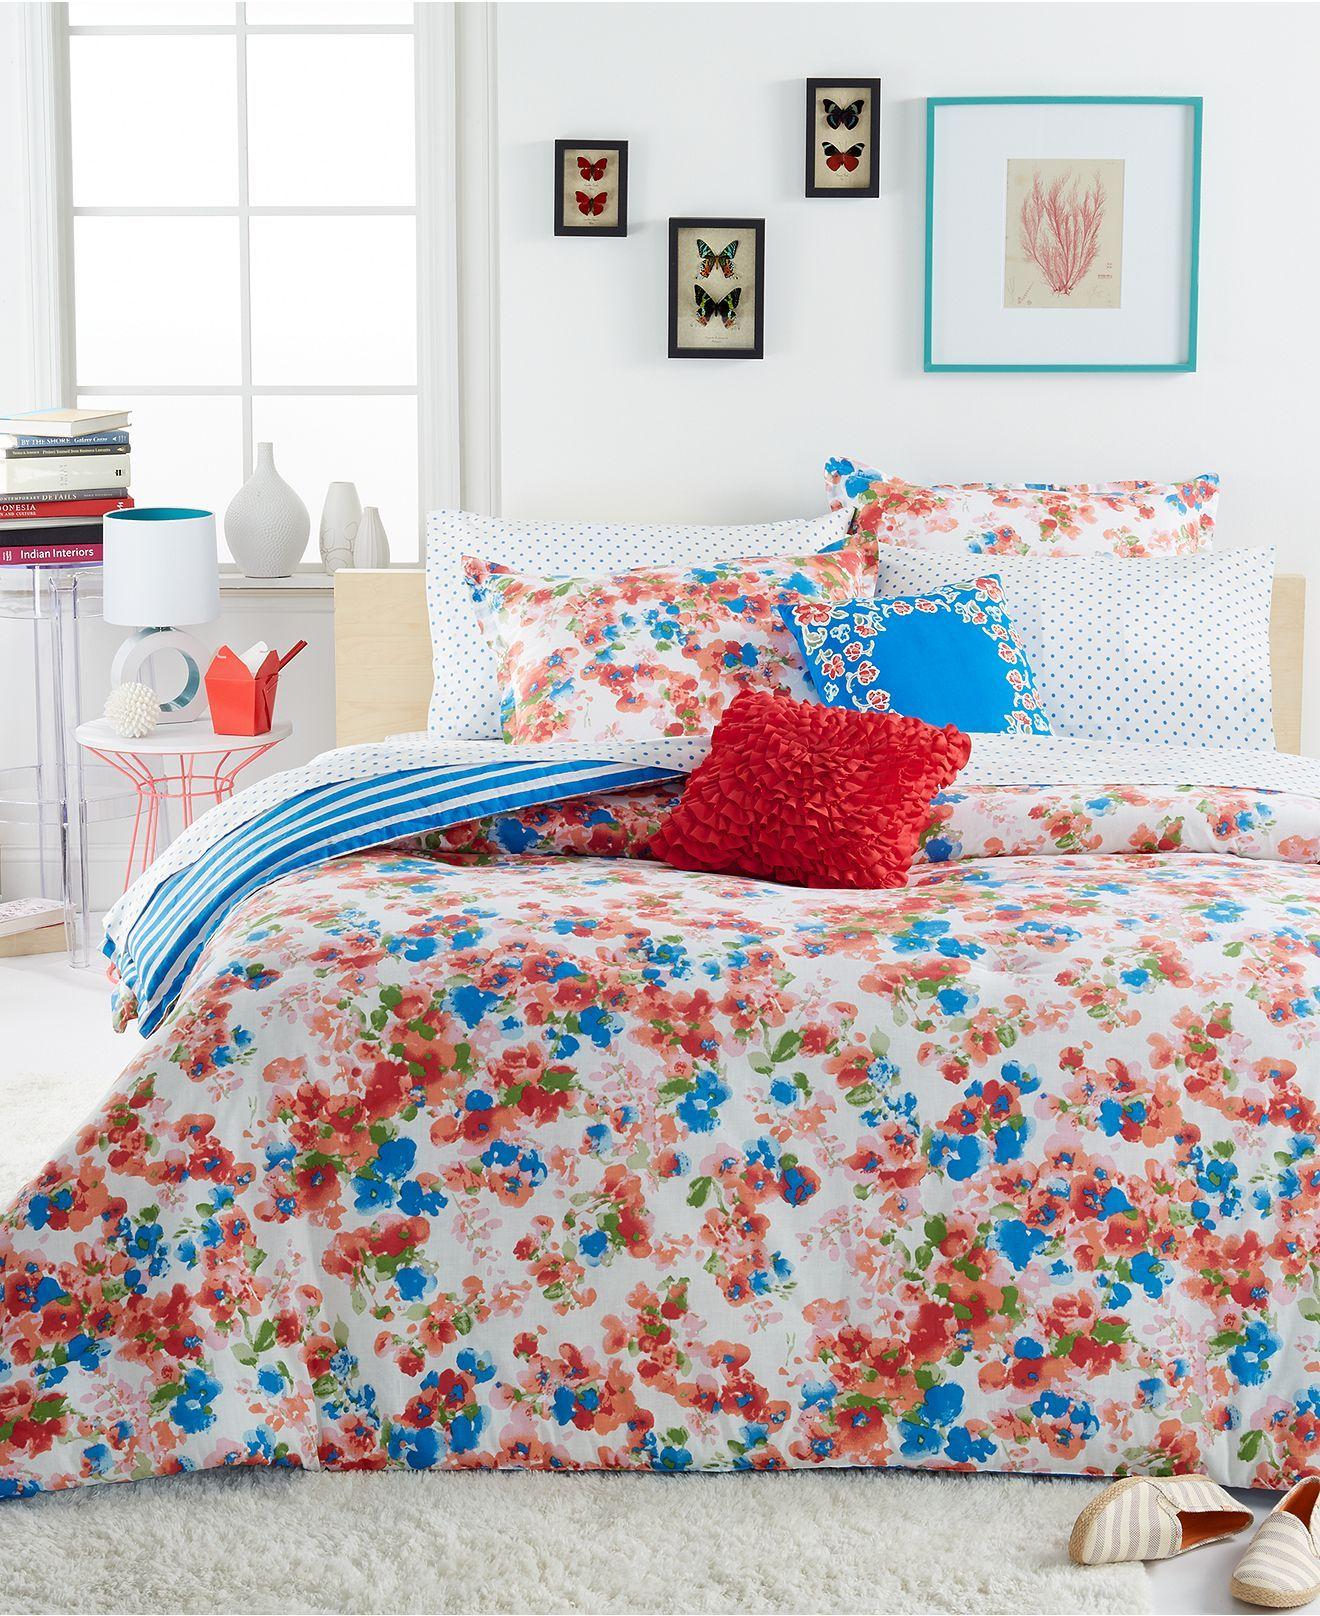 Macy Home Decor: Teen Vogue Rosie Posie Comforter Sets